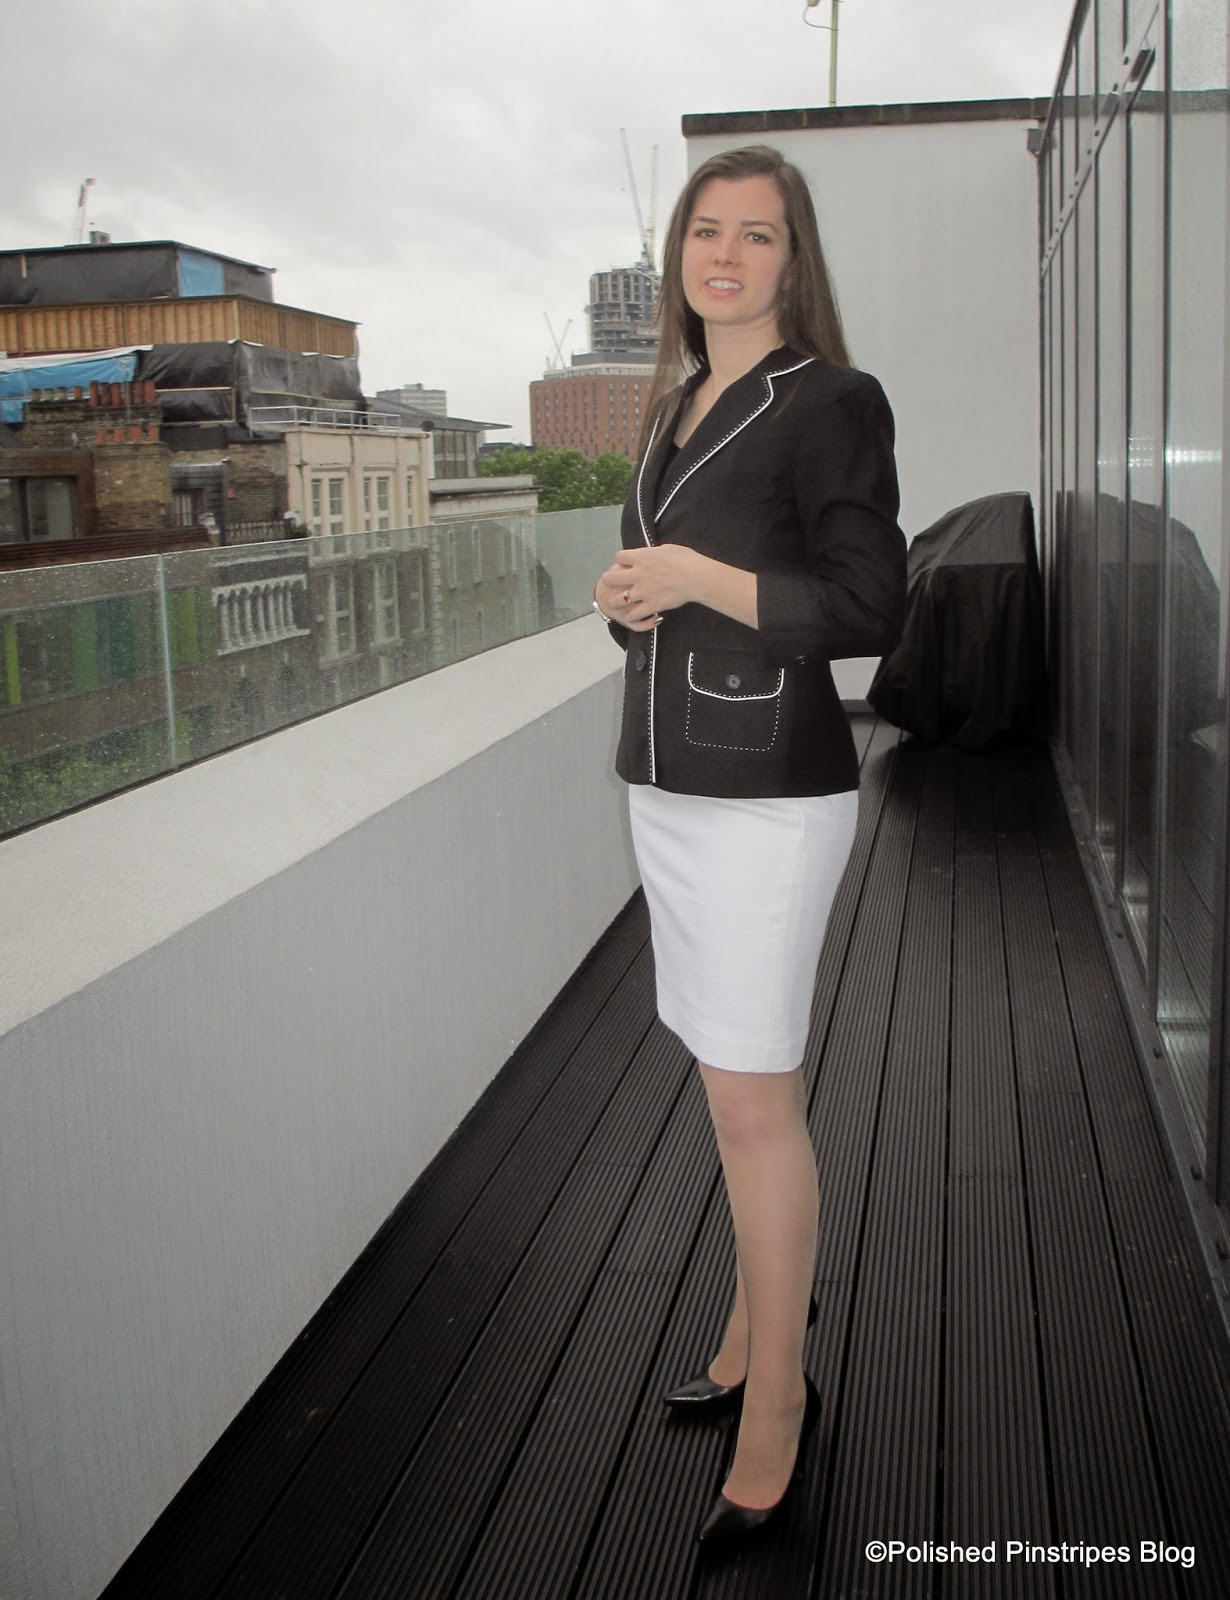 What To Wear To Work: Black U0026 White Blazer And Pencil Skirt